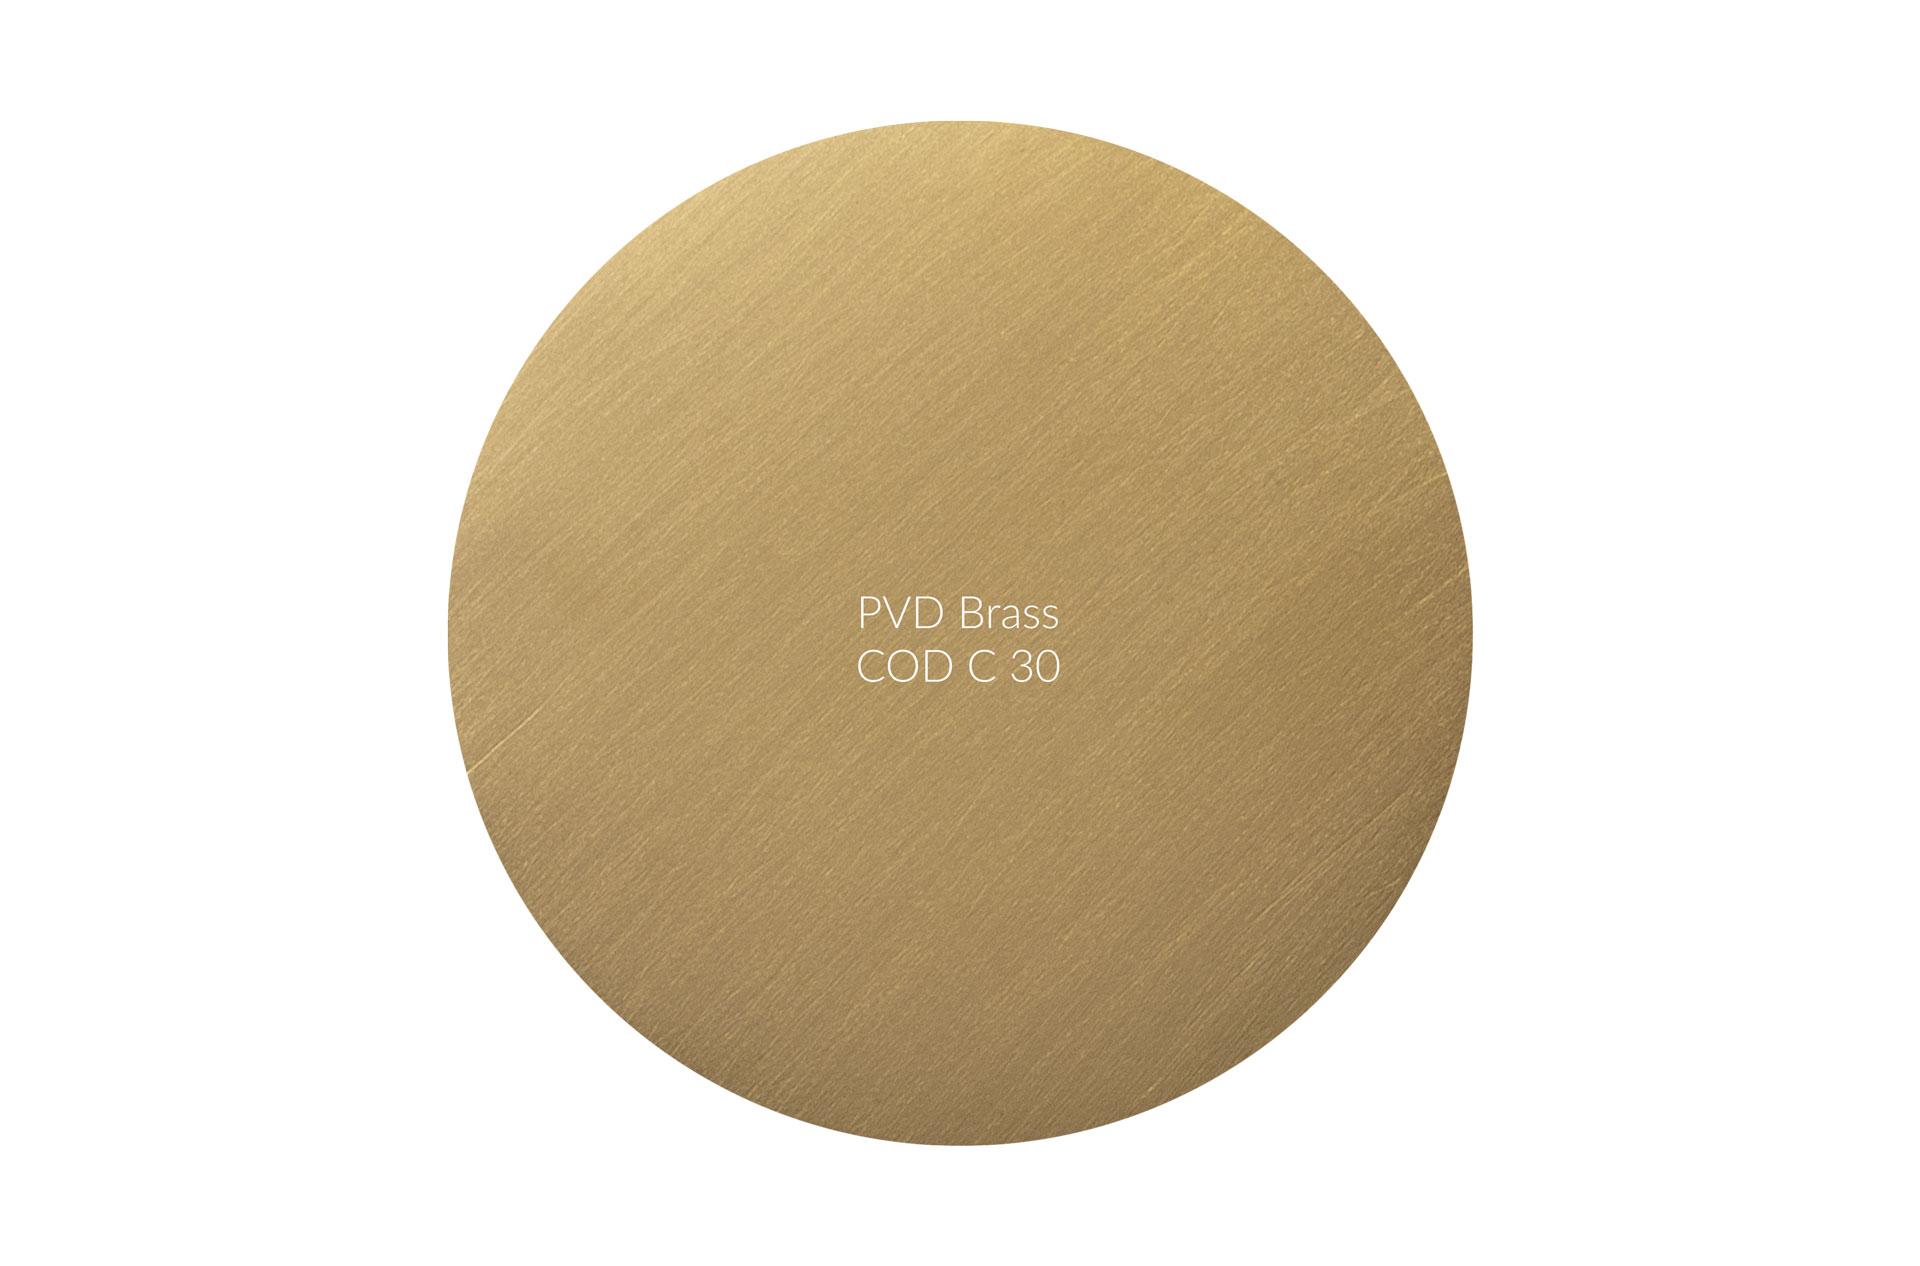 Dischetto PVD brass cod C 30 graffiato